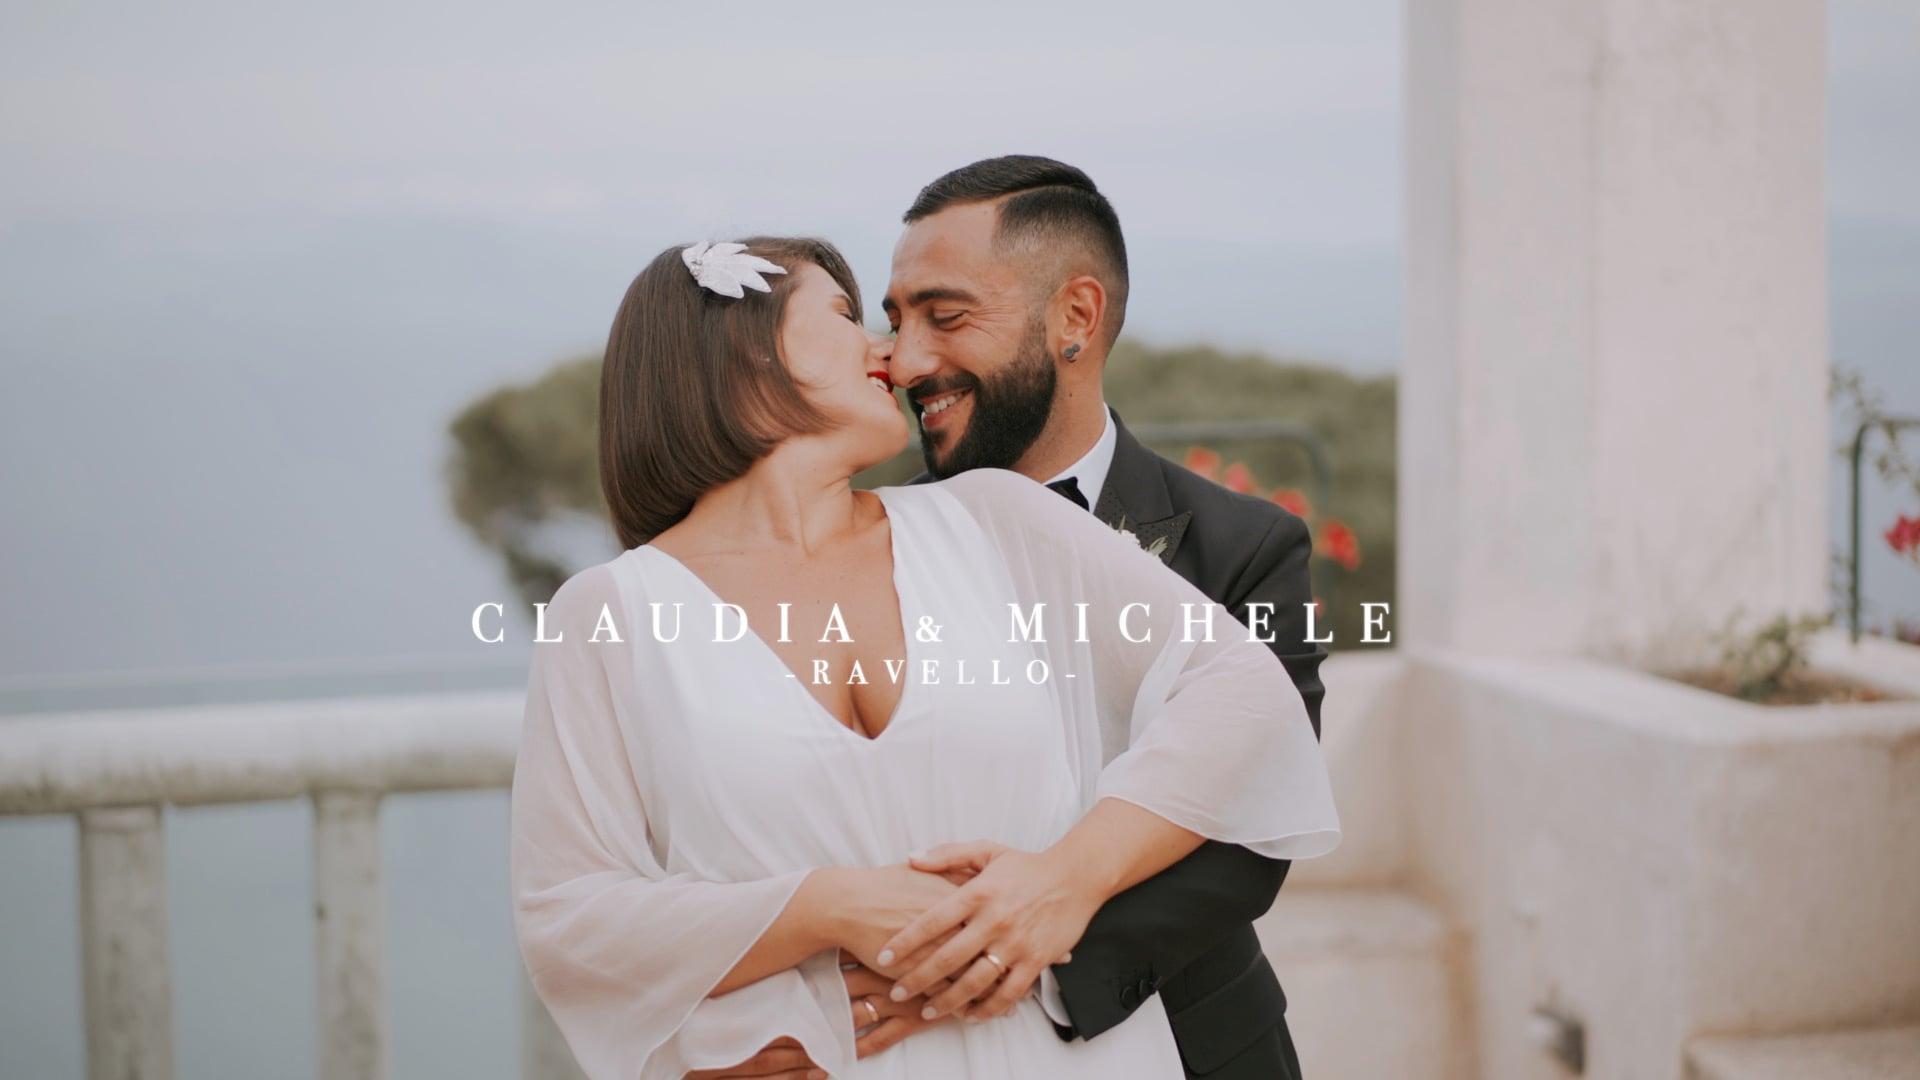 Claudia & Michele // Wedding in Ravello